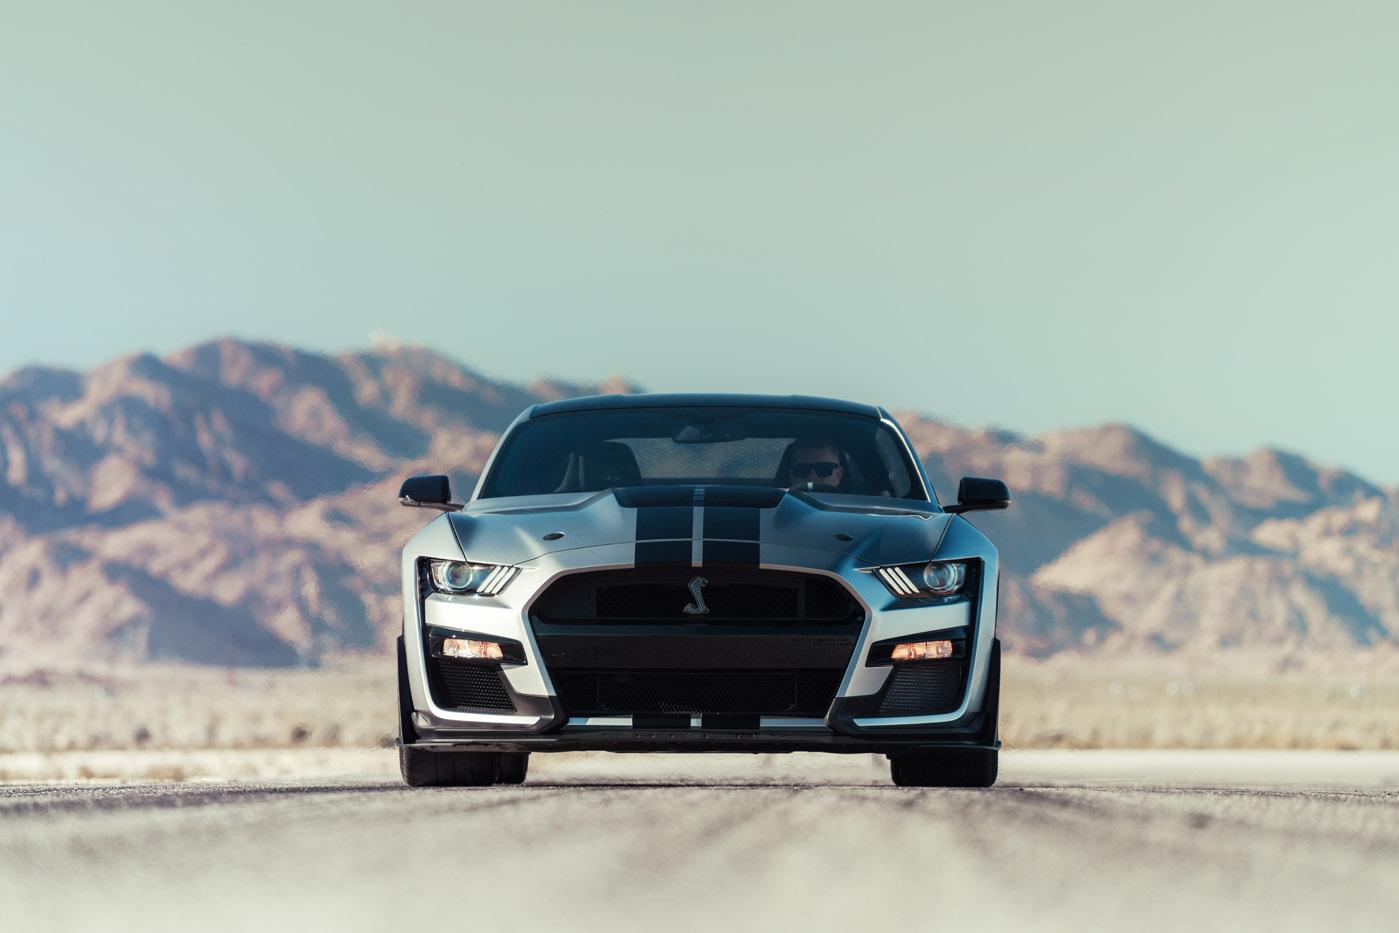 Ford Mustang Shelby GT500 - premiera, blog motoryzacyjny